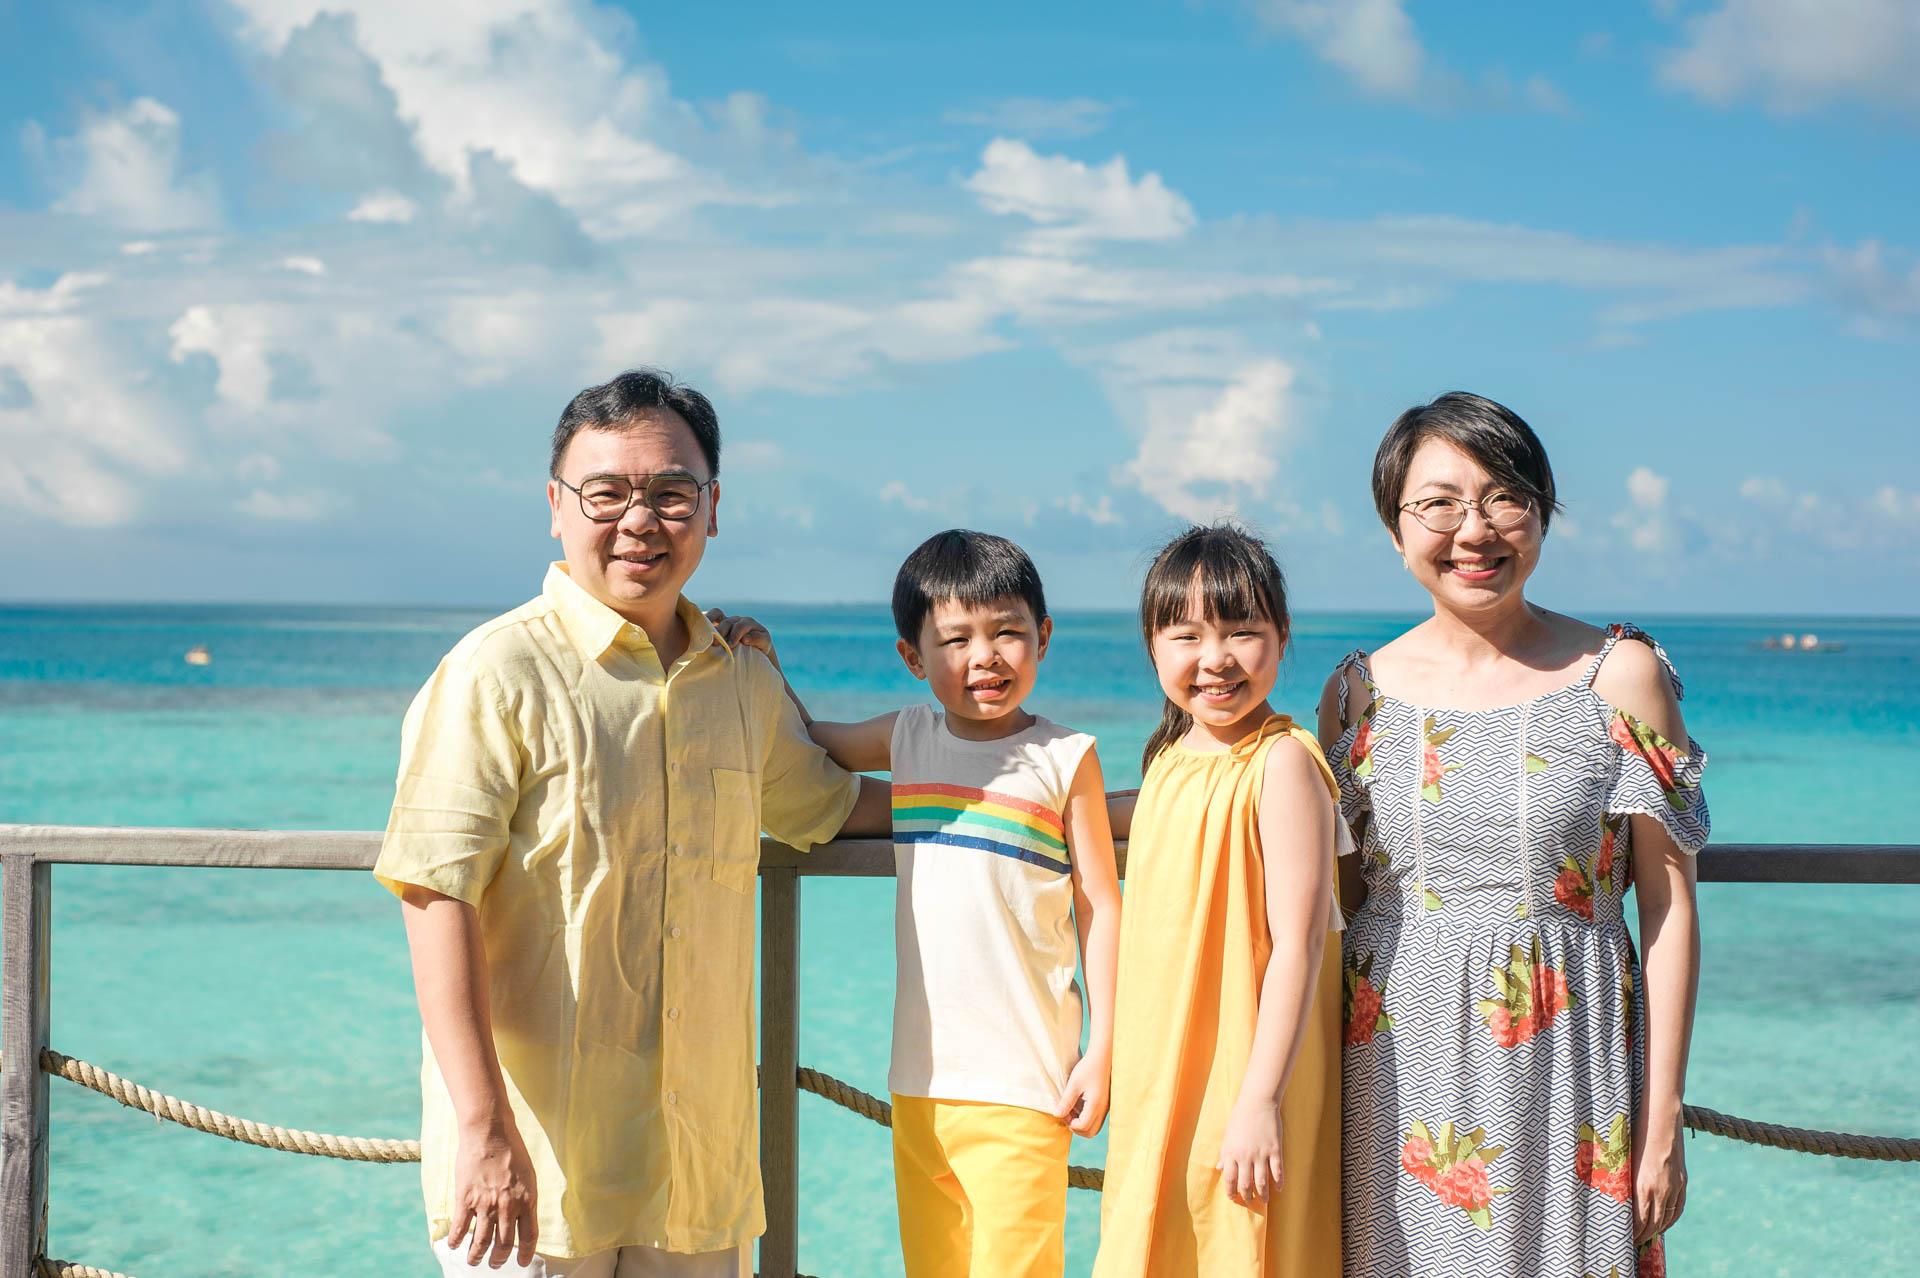 Jos Extended Family at Constance Moofushi Maldives 35